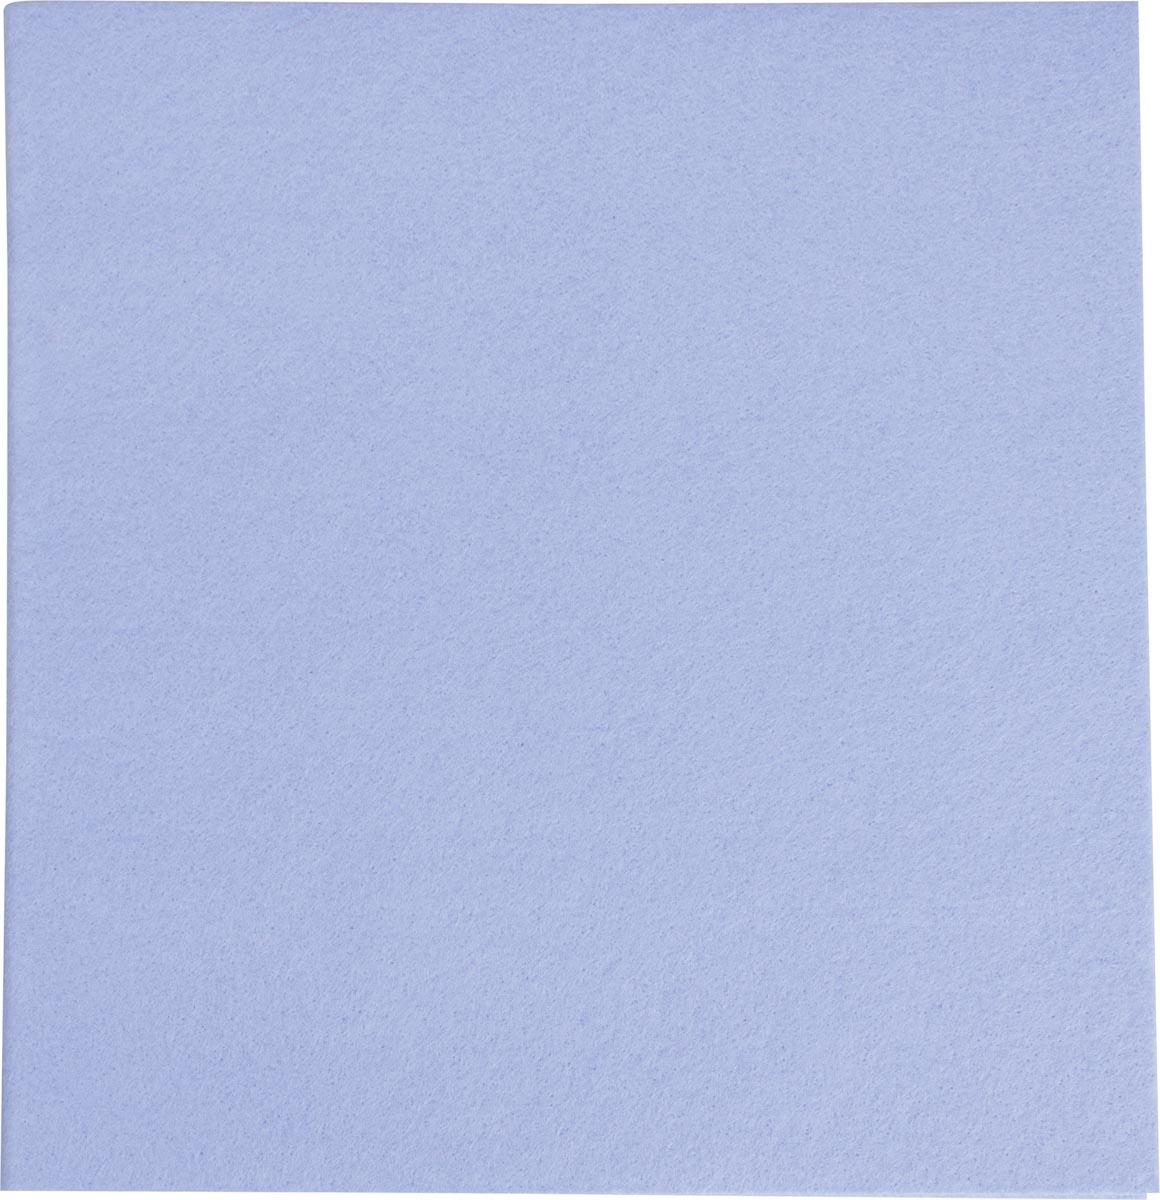 Vileda poetsdoek All Purpose, blauw, pak van 10 stuks